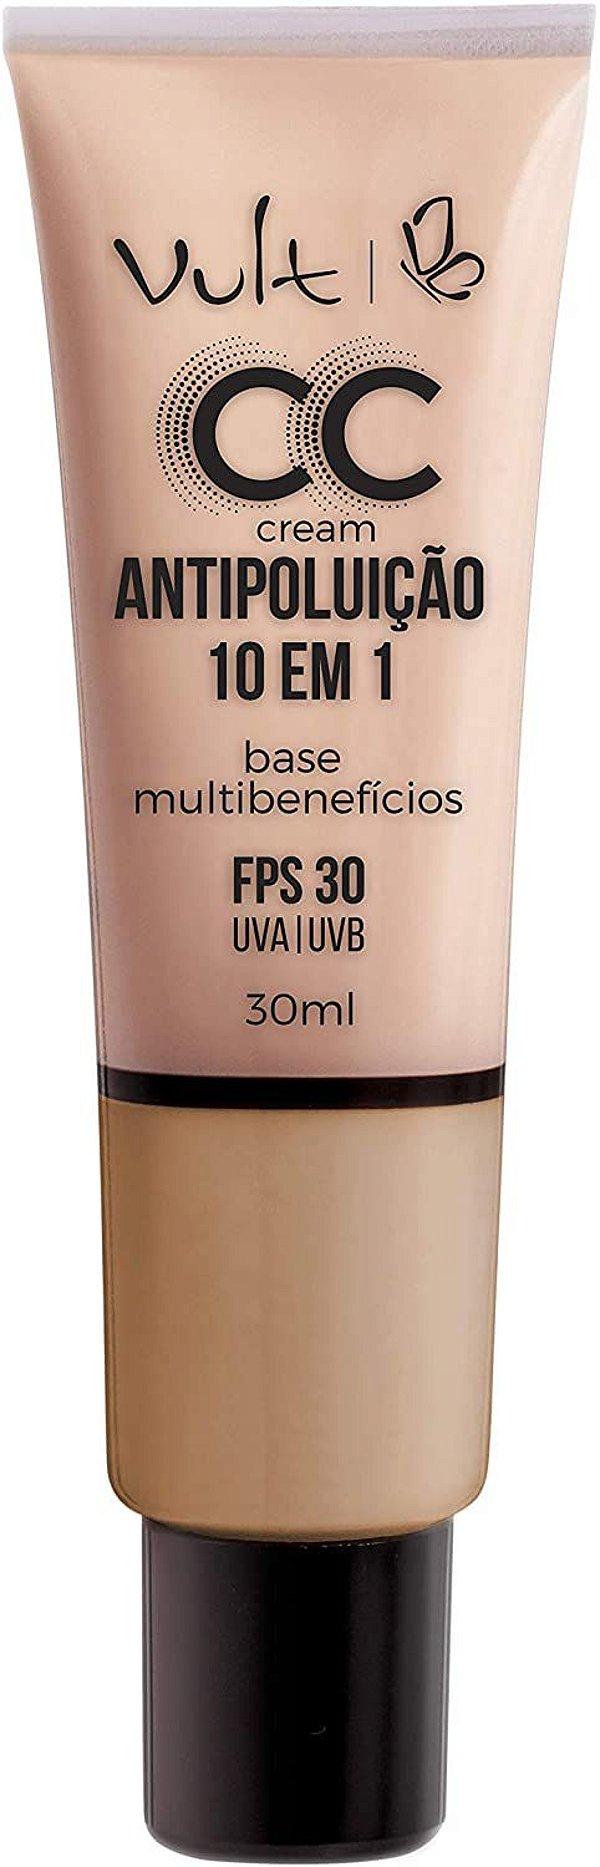 CC Cream Vult Base Multibenefícios 10 em 1- MB03 - 30ml